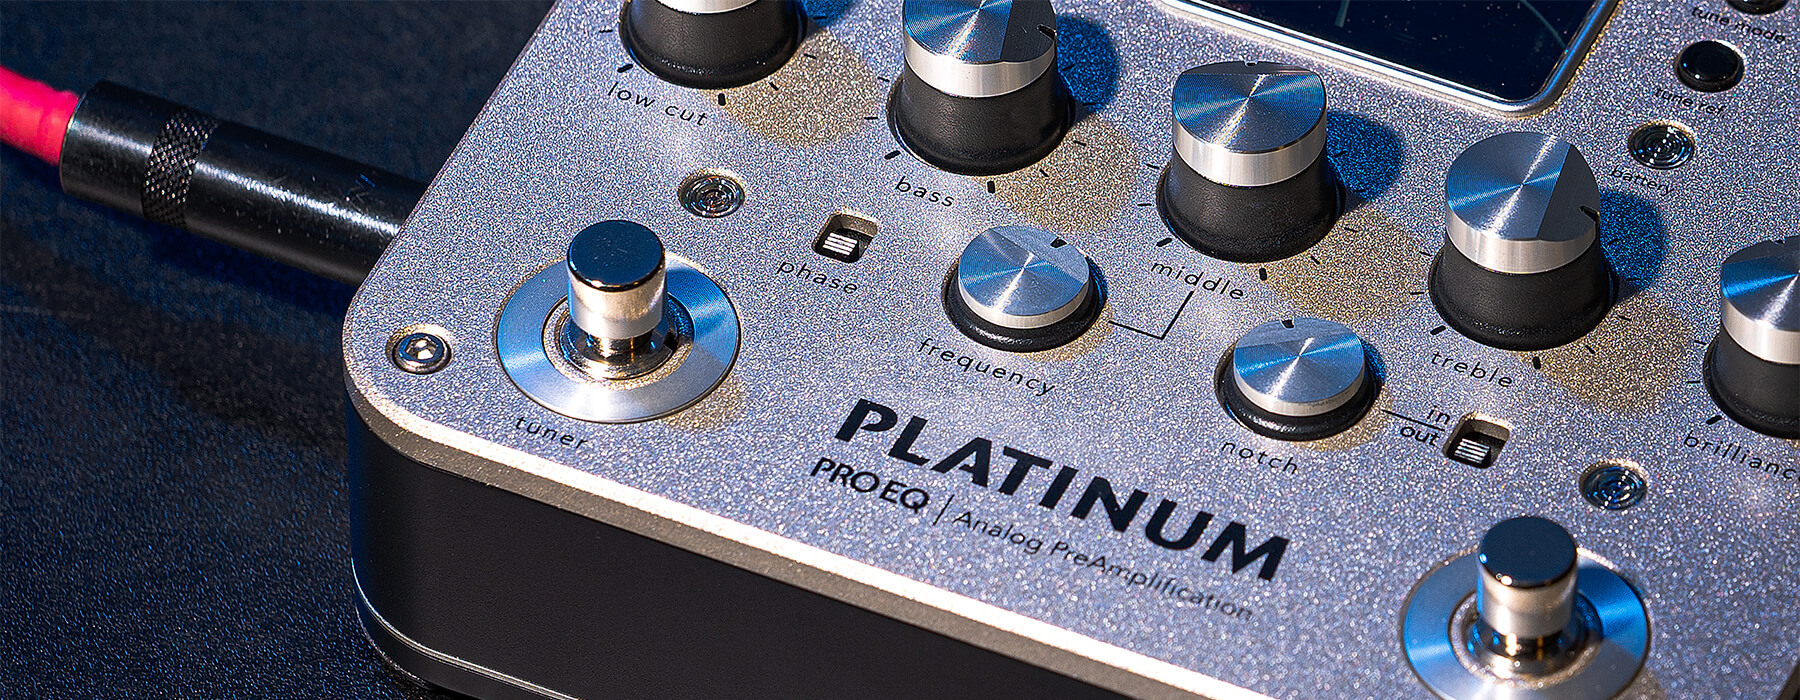 Platinum Pro EQ analog preamp PRO-PLT-201 close up on stage floor